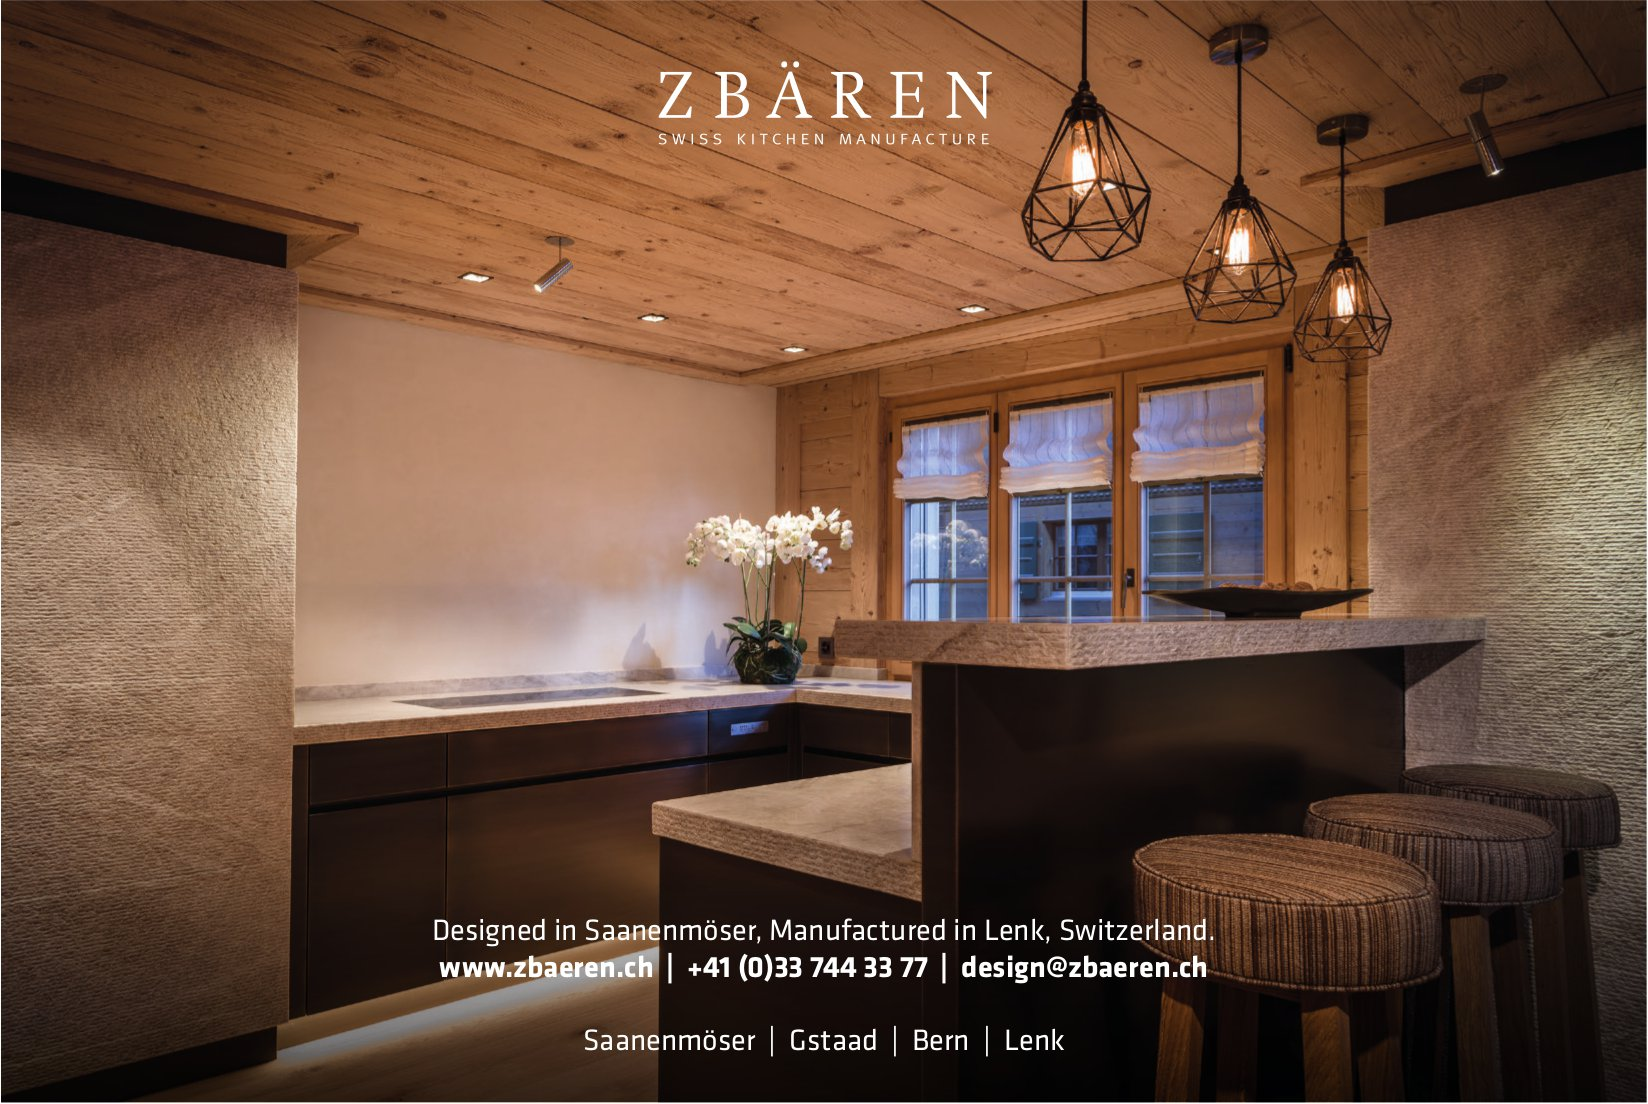 Zbären Swiss Kitchen Manufacture, Gstaad, Bern, Saanenmöser & Lenk